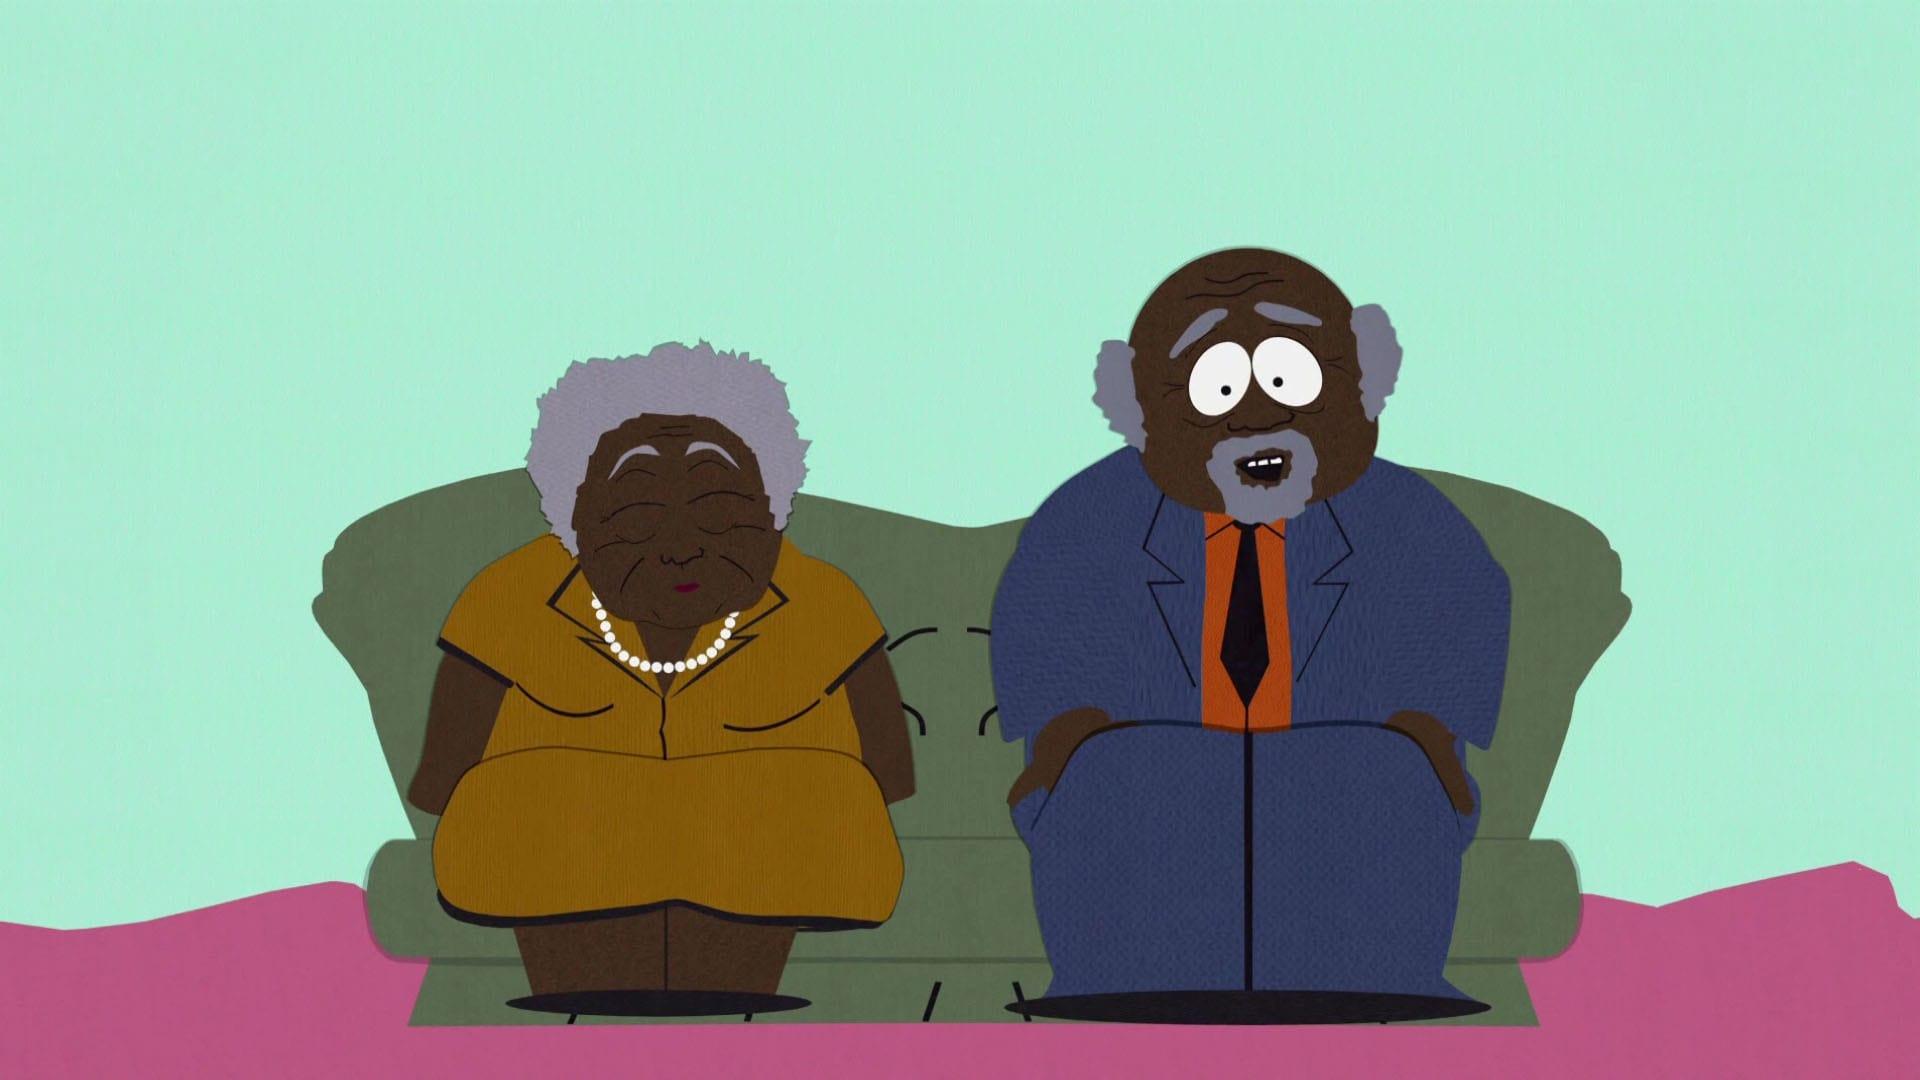 South Park - Season 3 Episode 3 : The Succubus